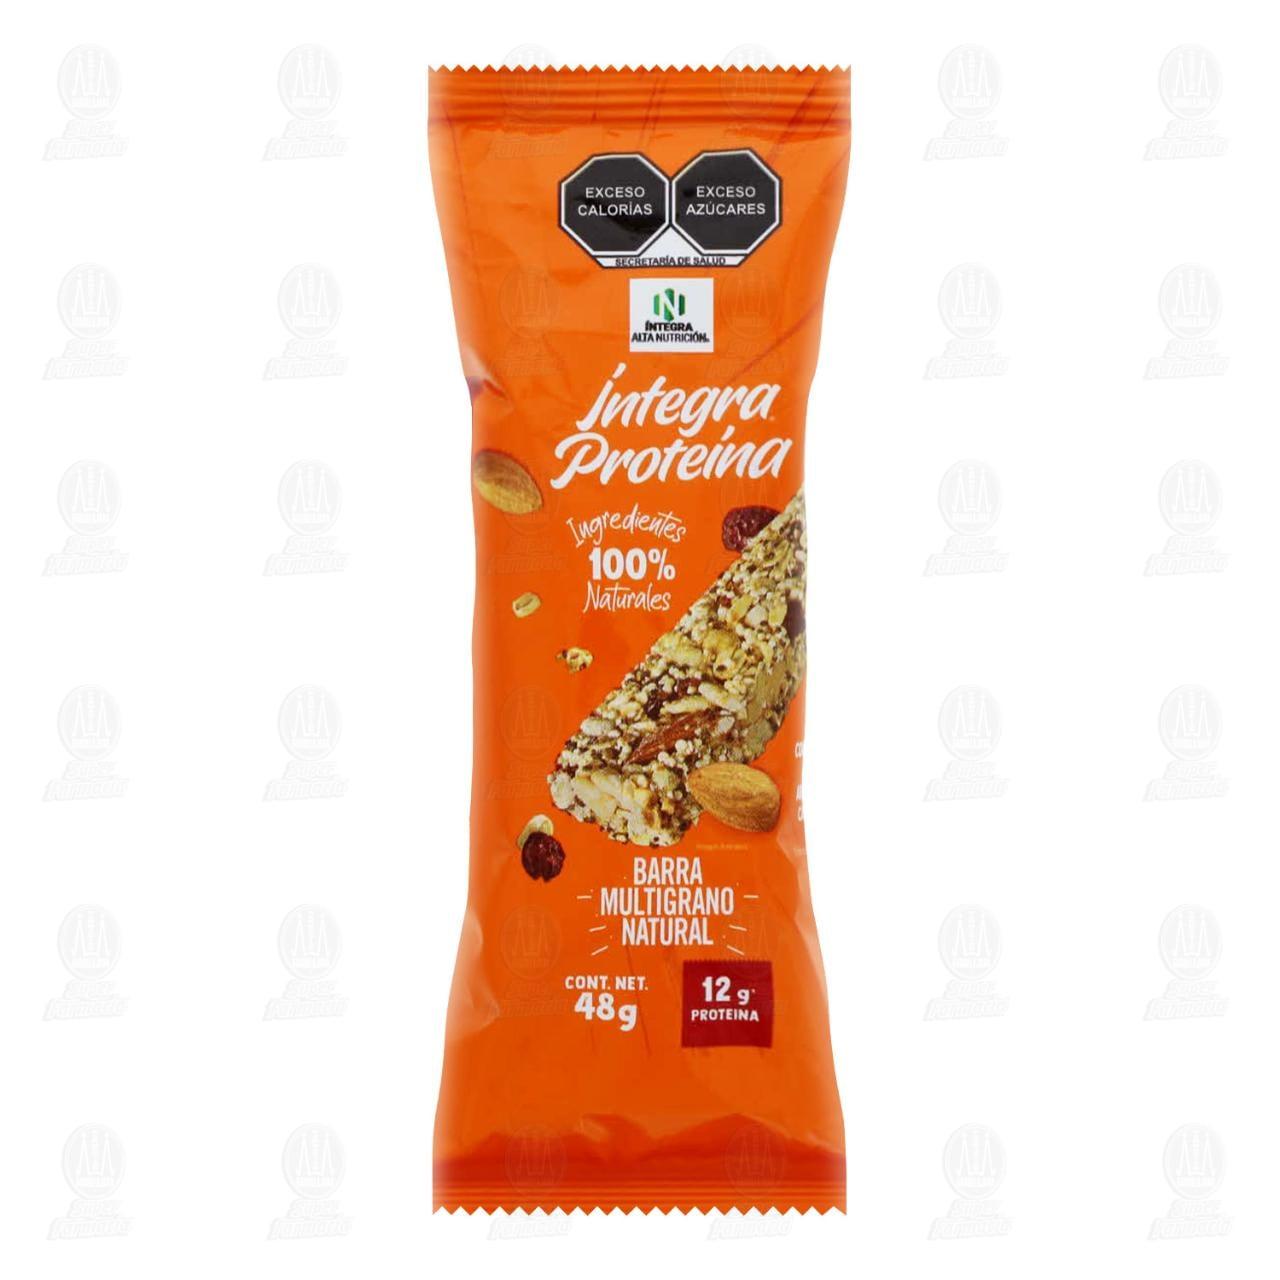 Barra Íntegra Proteína Multigrano Sin Azúcar, 48 gr.